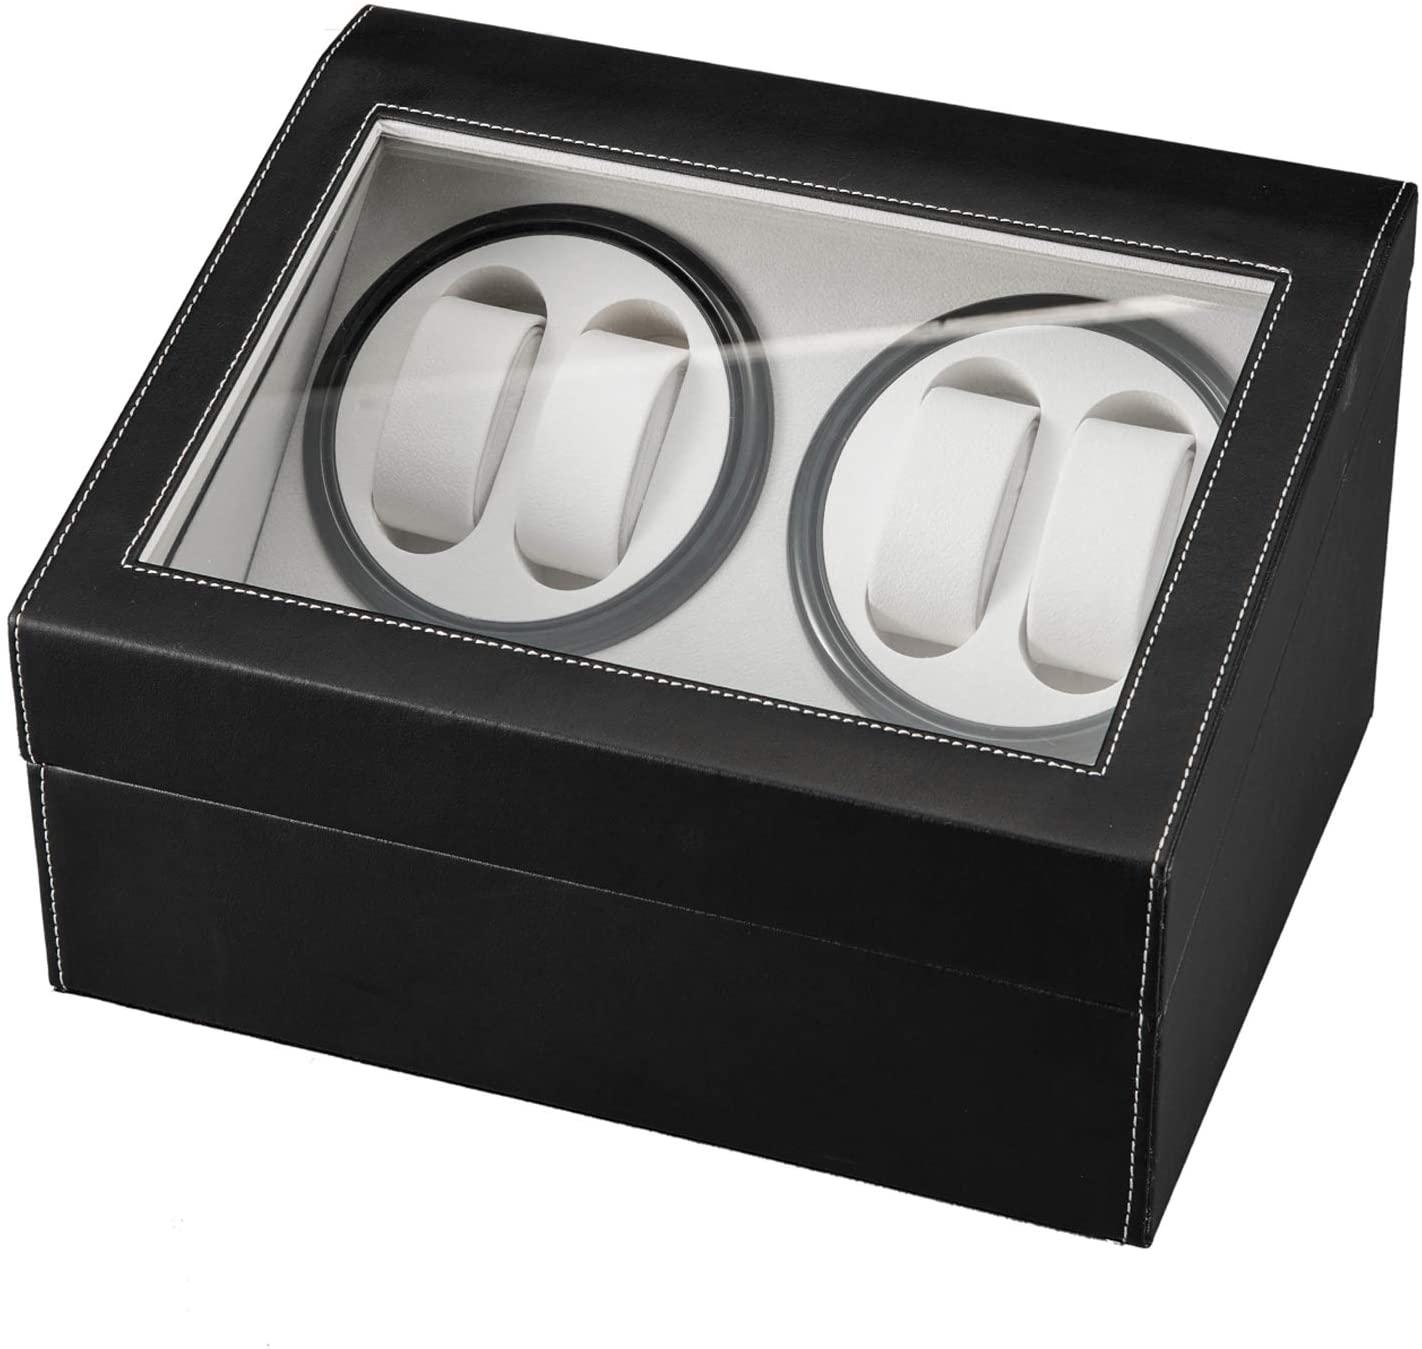 Jewelry Box for Women Display Case, Black Leather Watch Winder Storage Auto Display Case Box 4 6 Automatic Rotation U.S